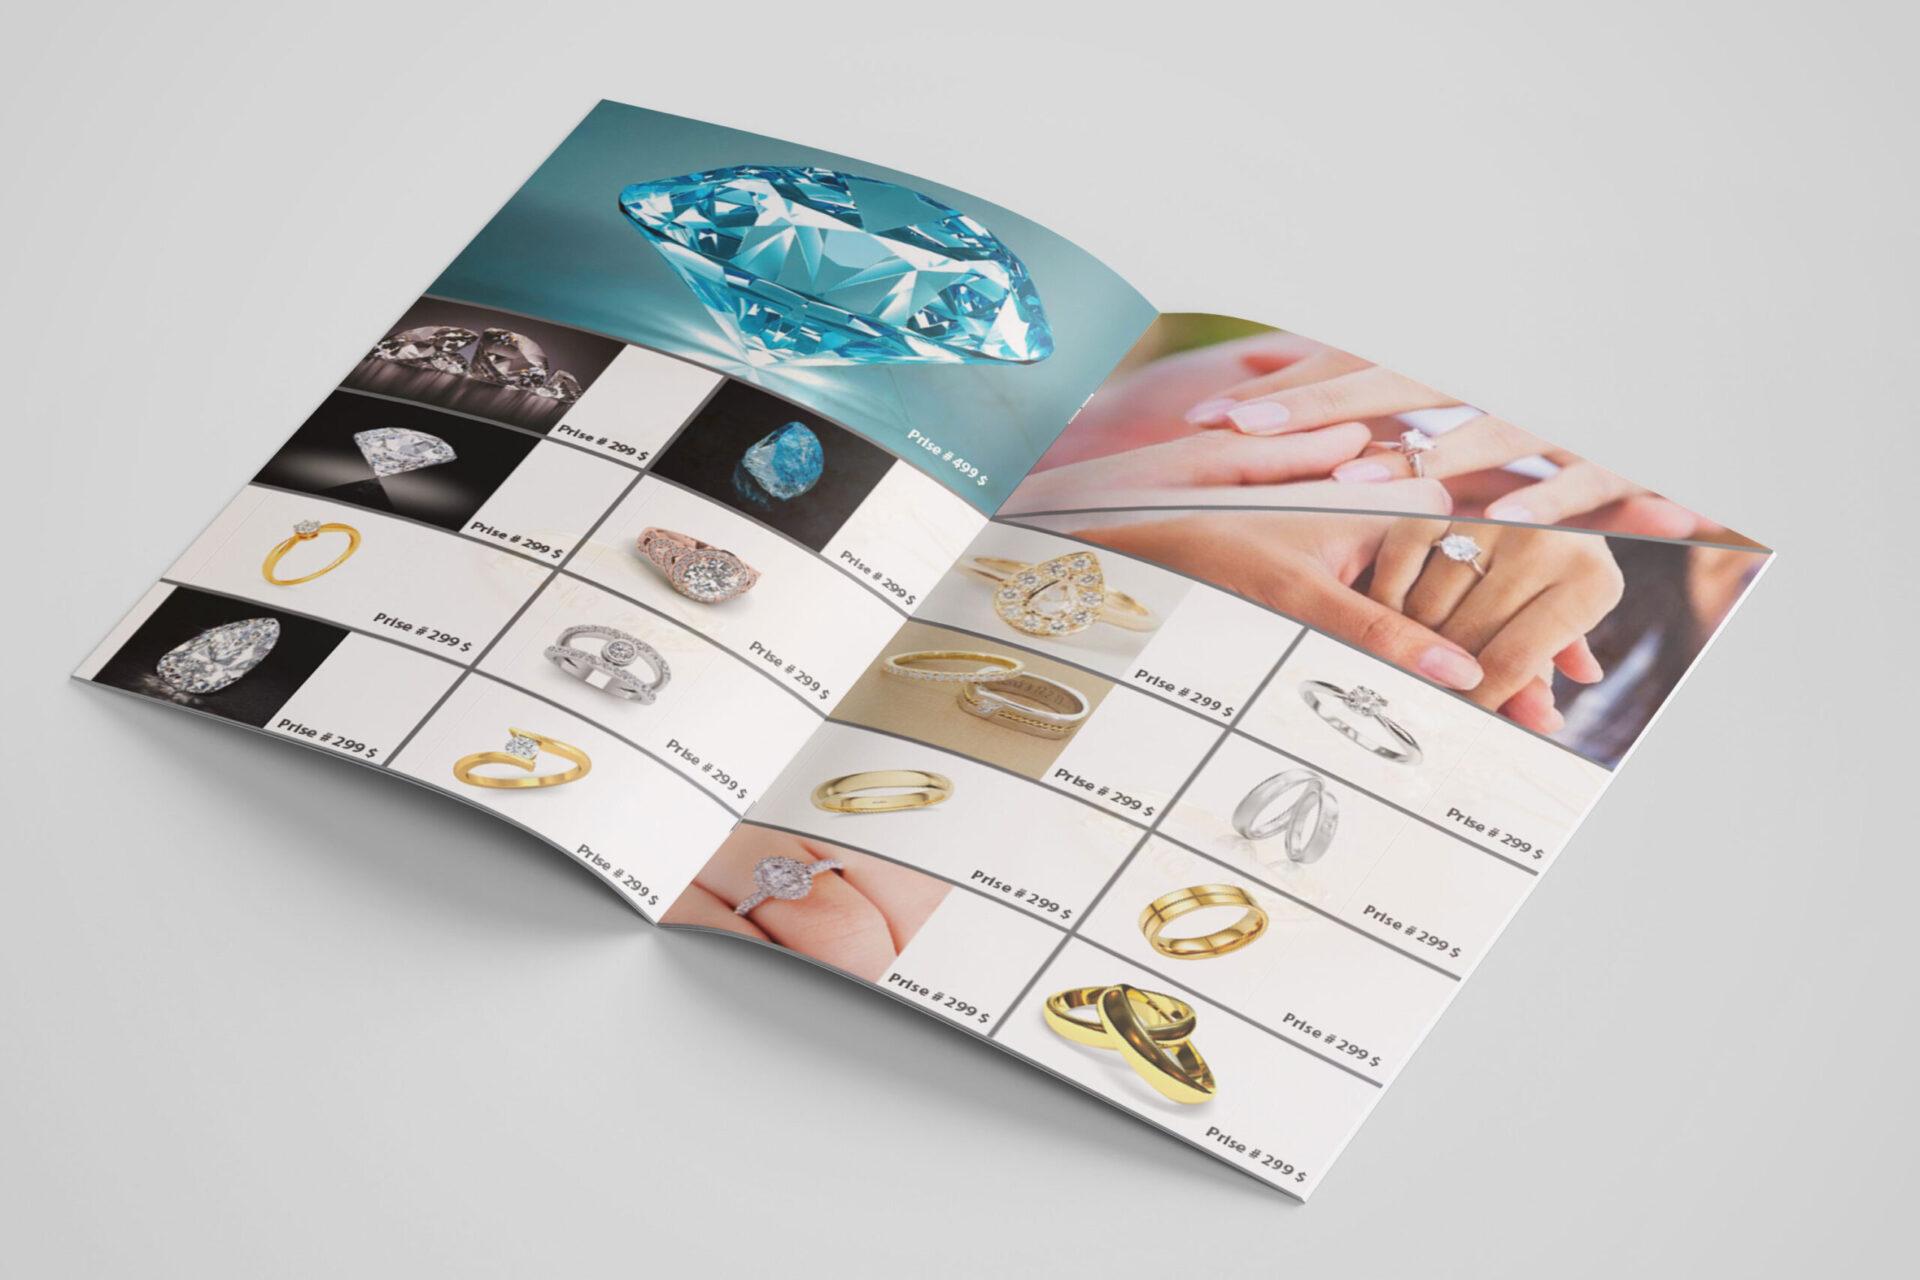 Catalogue Design || Clipping Path Services || Photo Editing Services || Image Editing Services